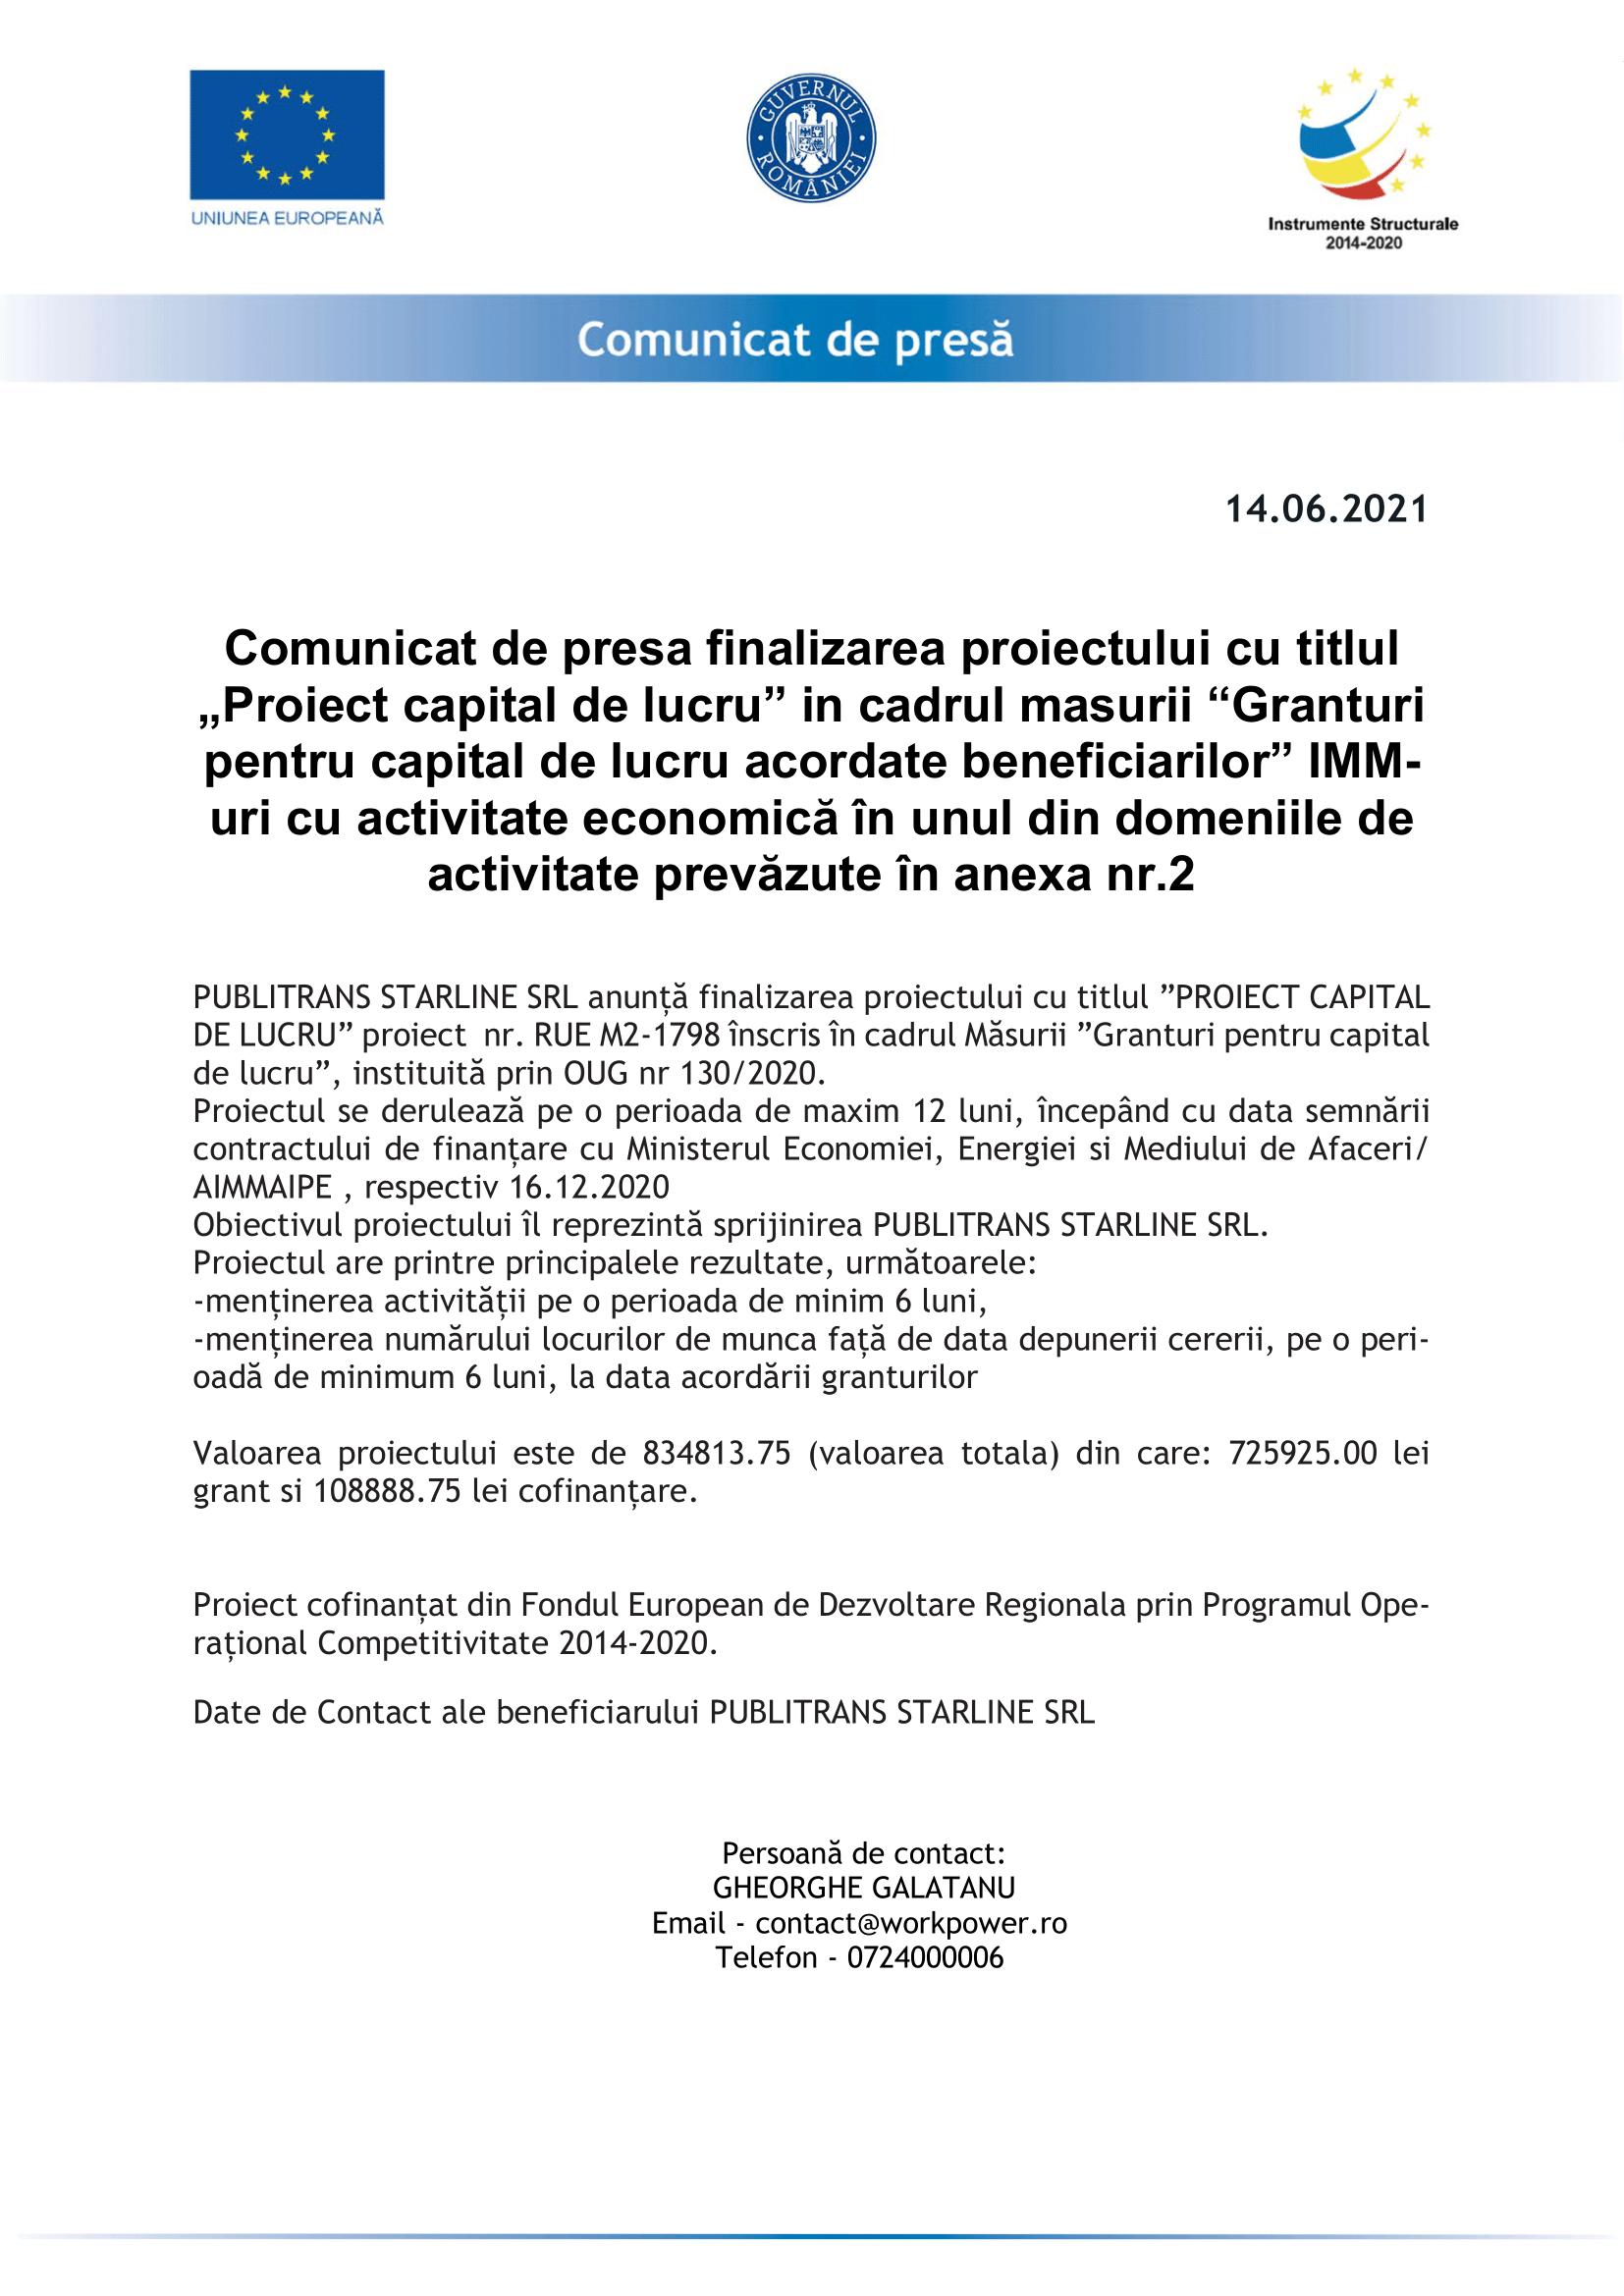 MODEL-Comunicat_de_Presa_benef-finali - FINALIZARE PUBLITRANS STARLINE-1